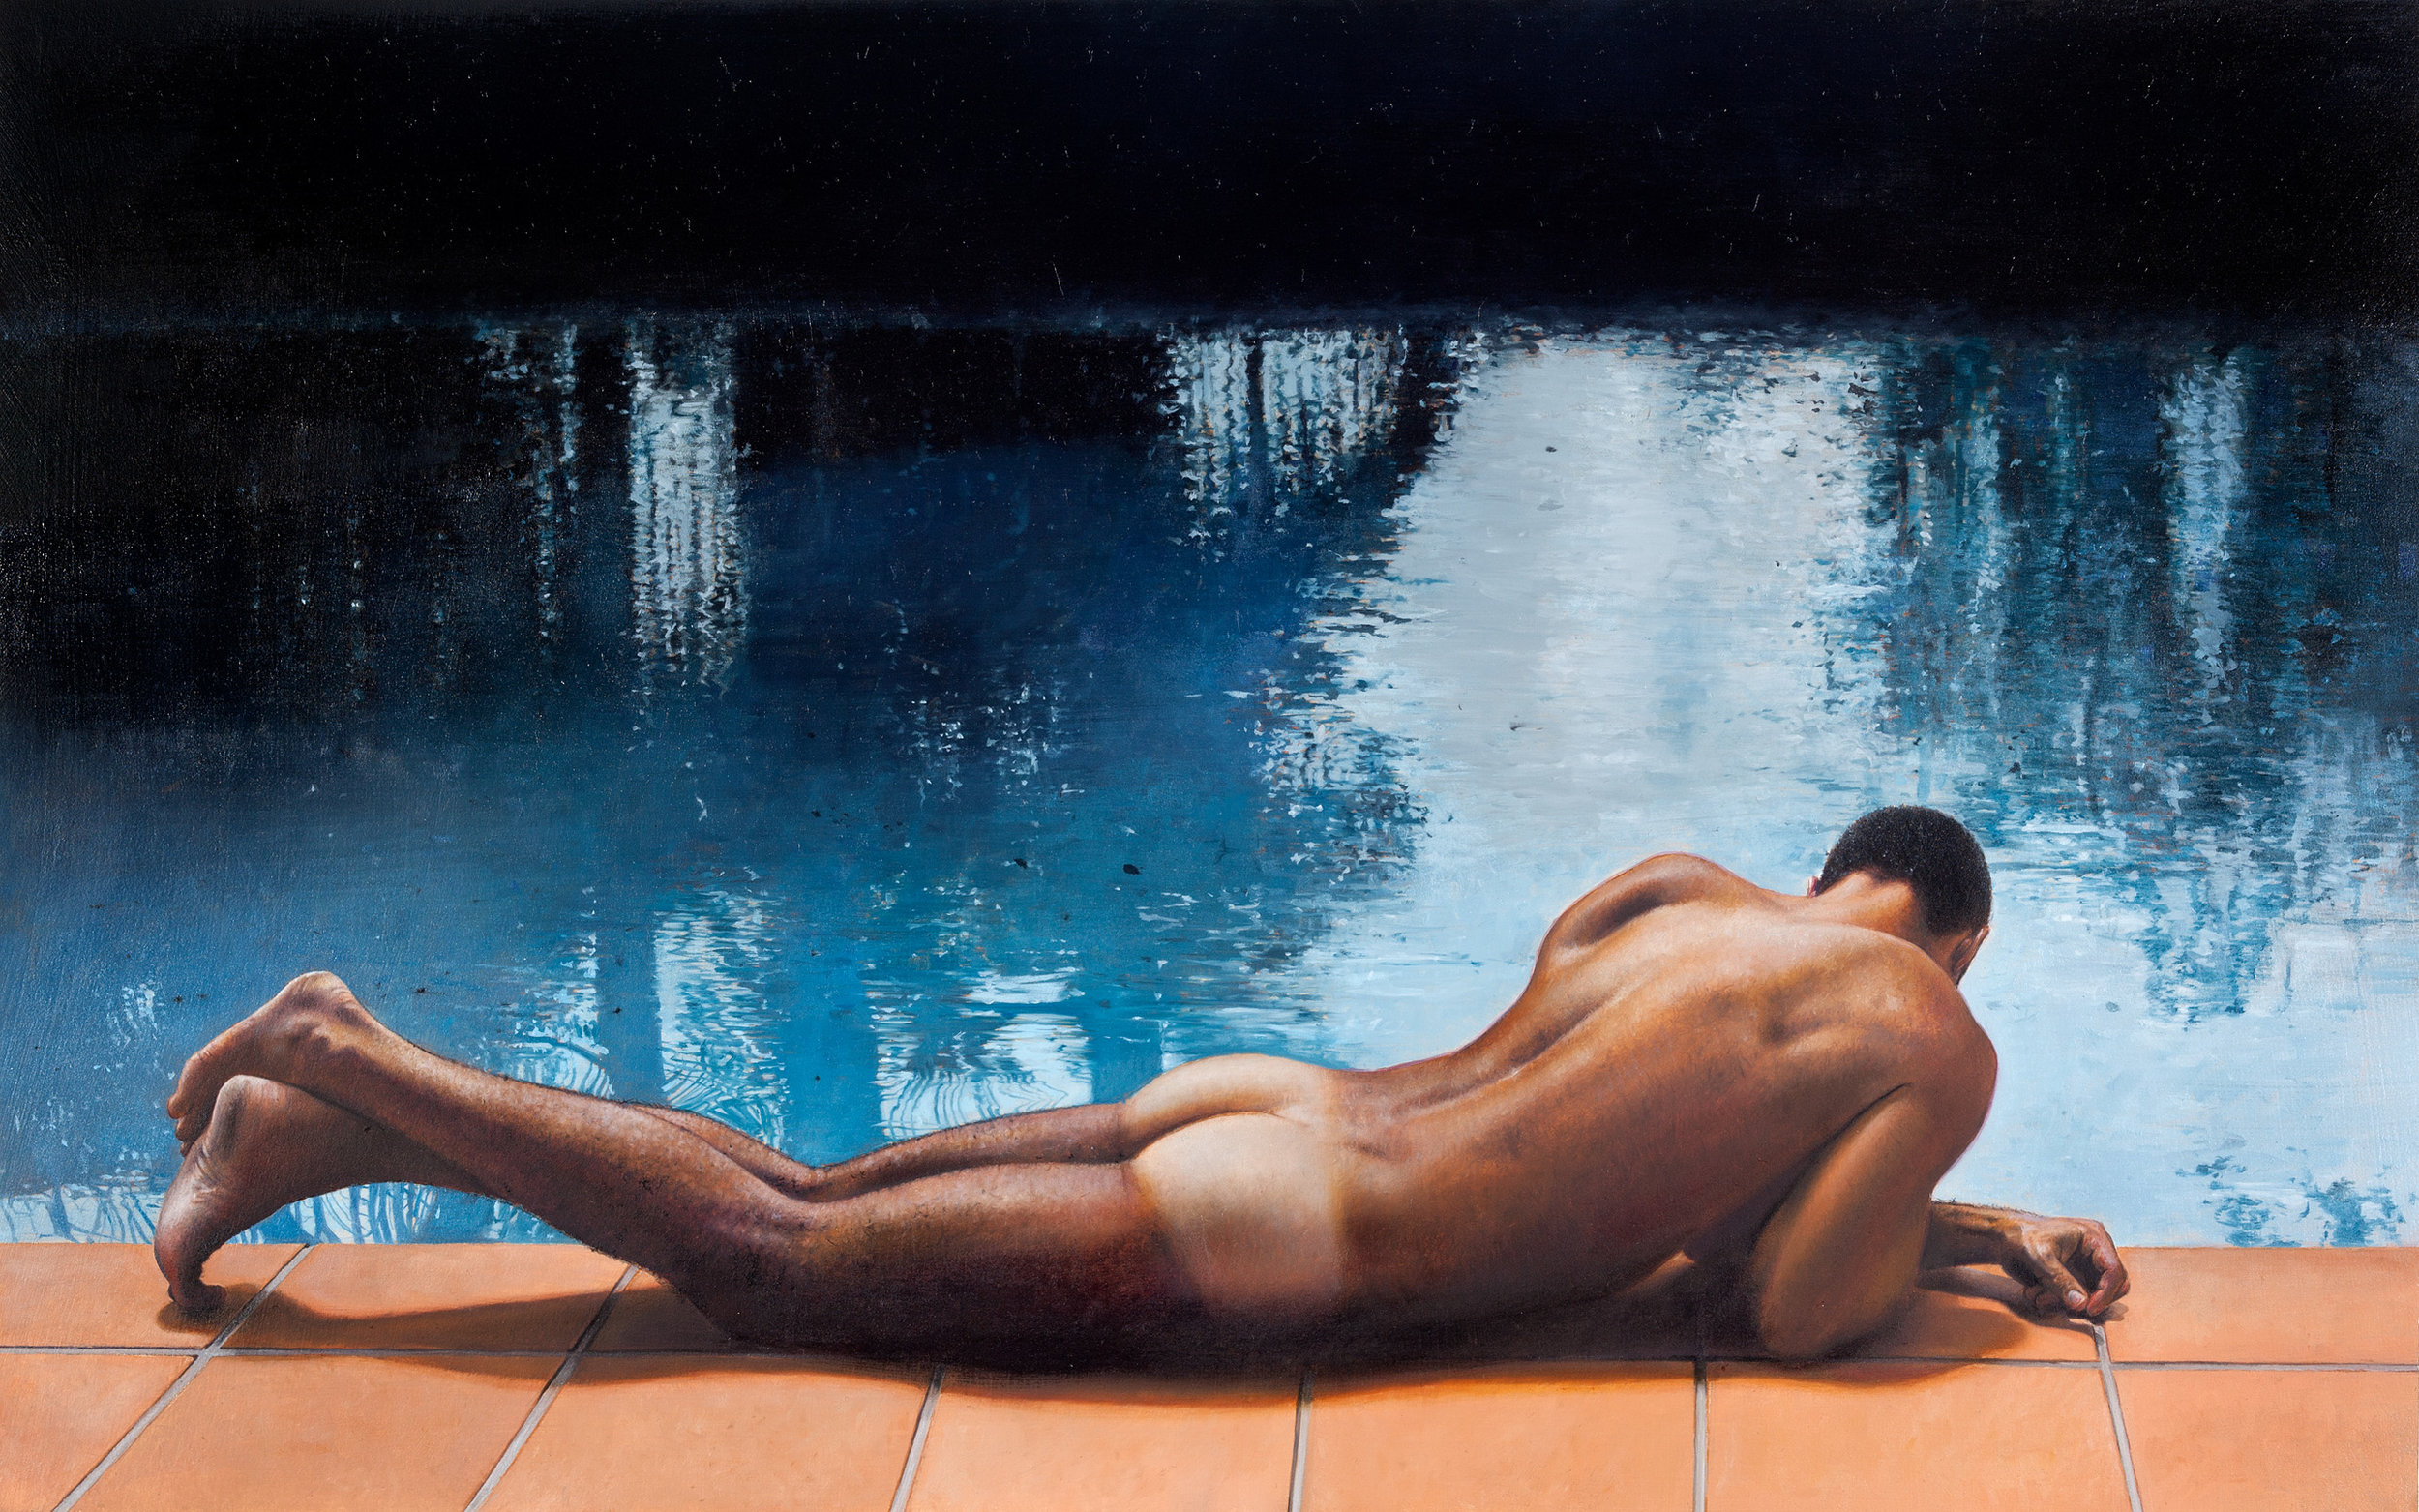 Michael Zavros,  Sunbather , 2017, oil on aluminium, 400 x 200 mm